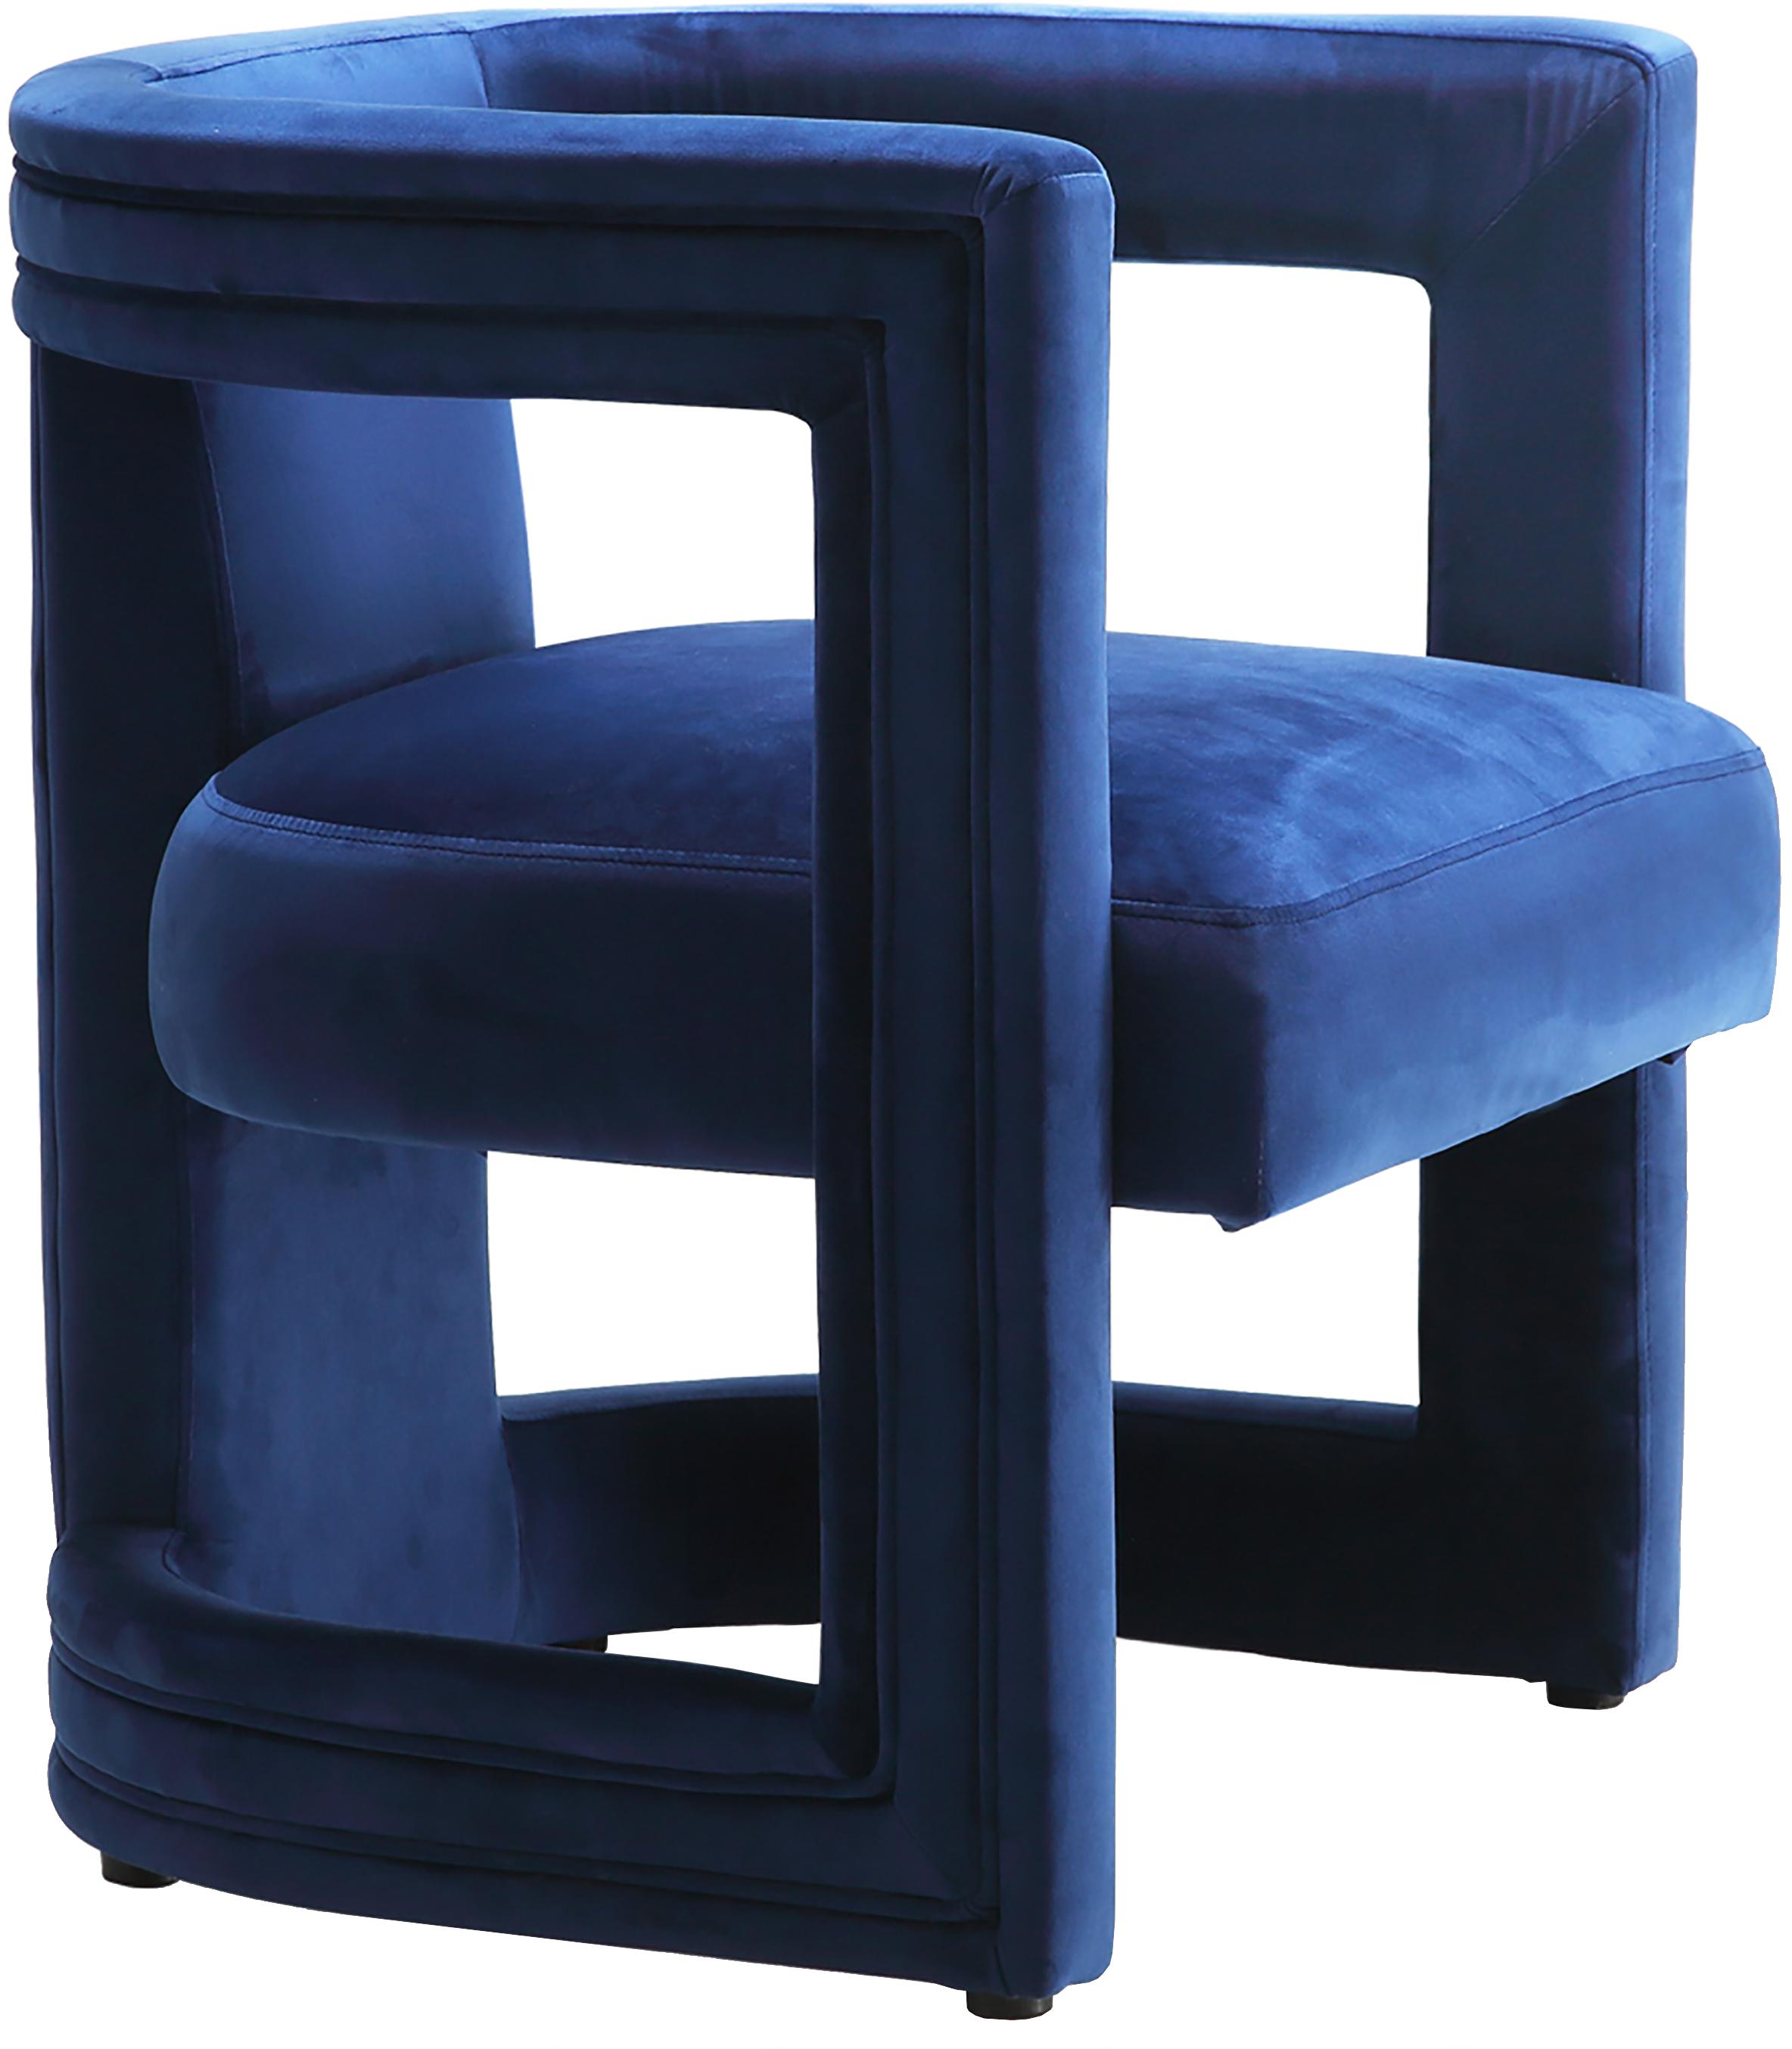 Blair Navy Velvet Accent Chair